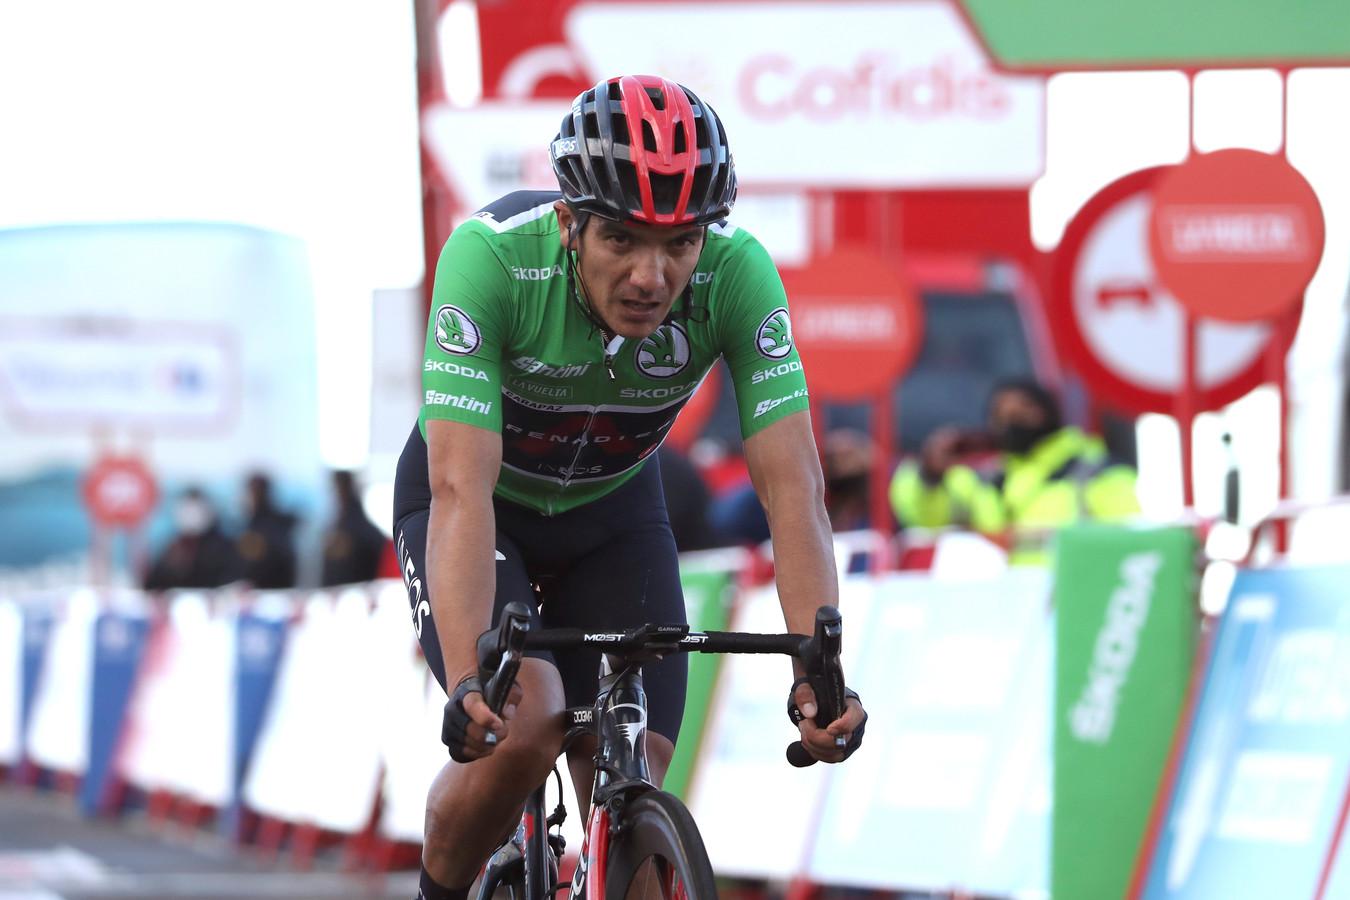 Richard Carapaz na etappe 17 van de Vuelta.